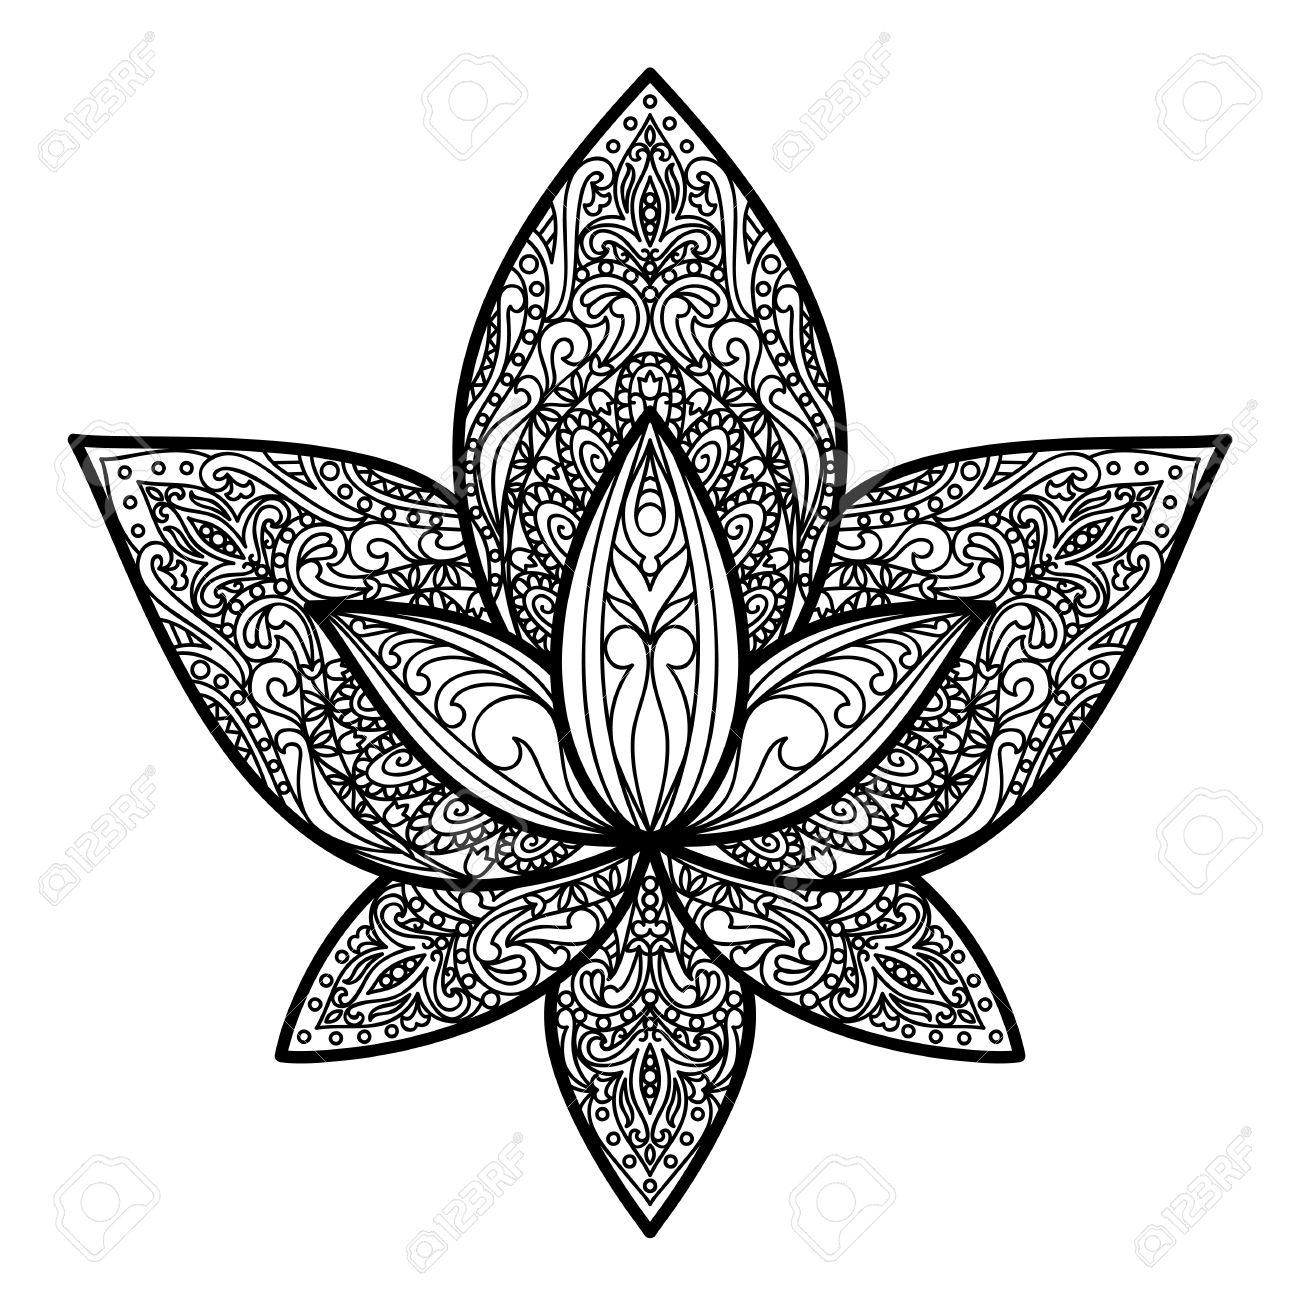 Tatuaje De Loto. Símbolo Floral De Amuletos, Impresiones Textiles ...